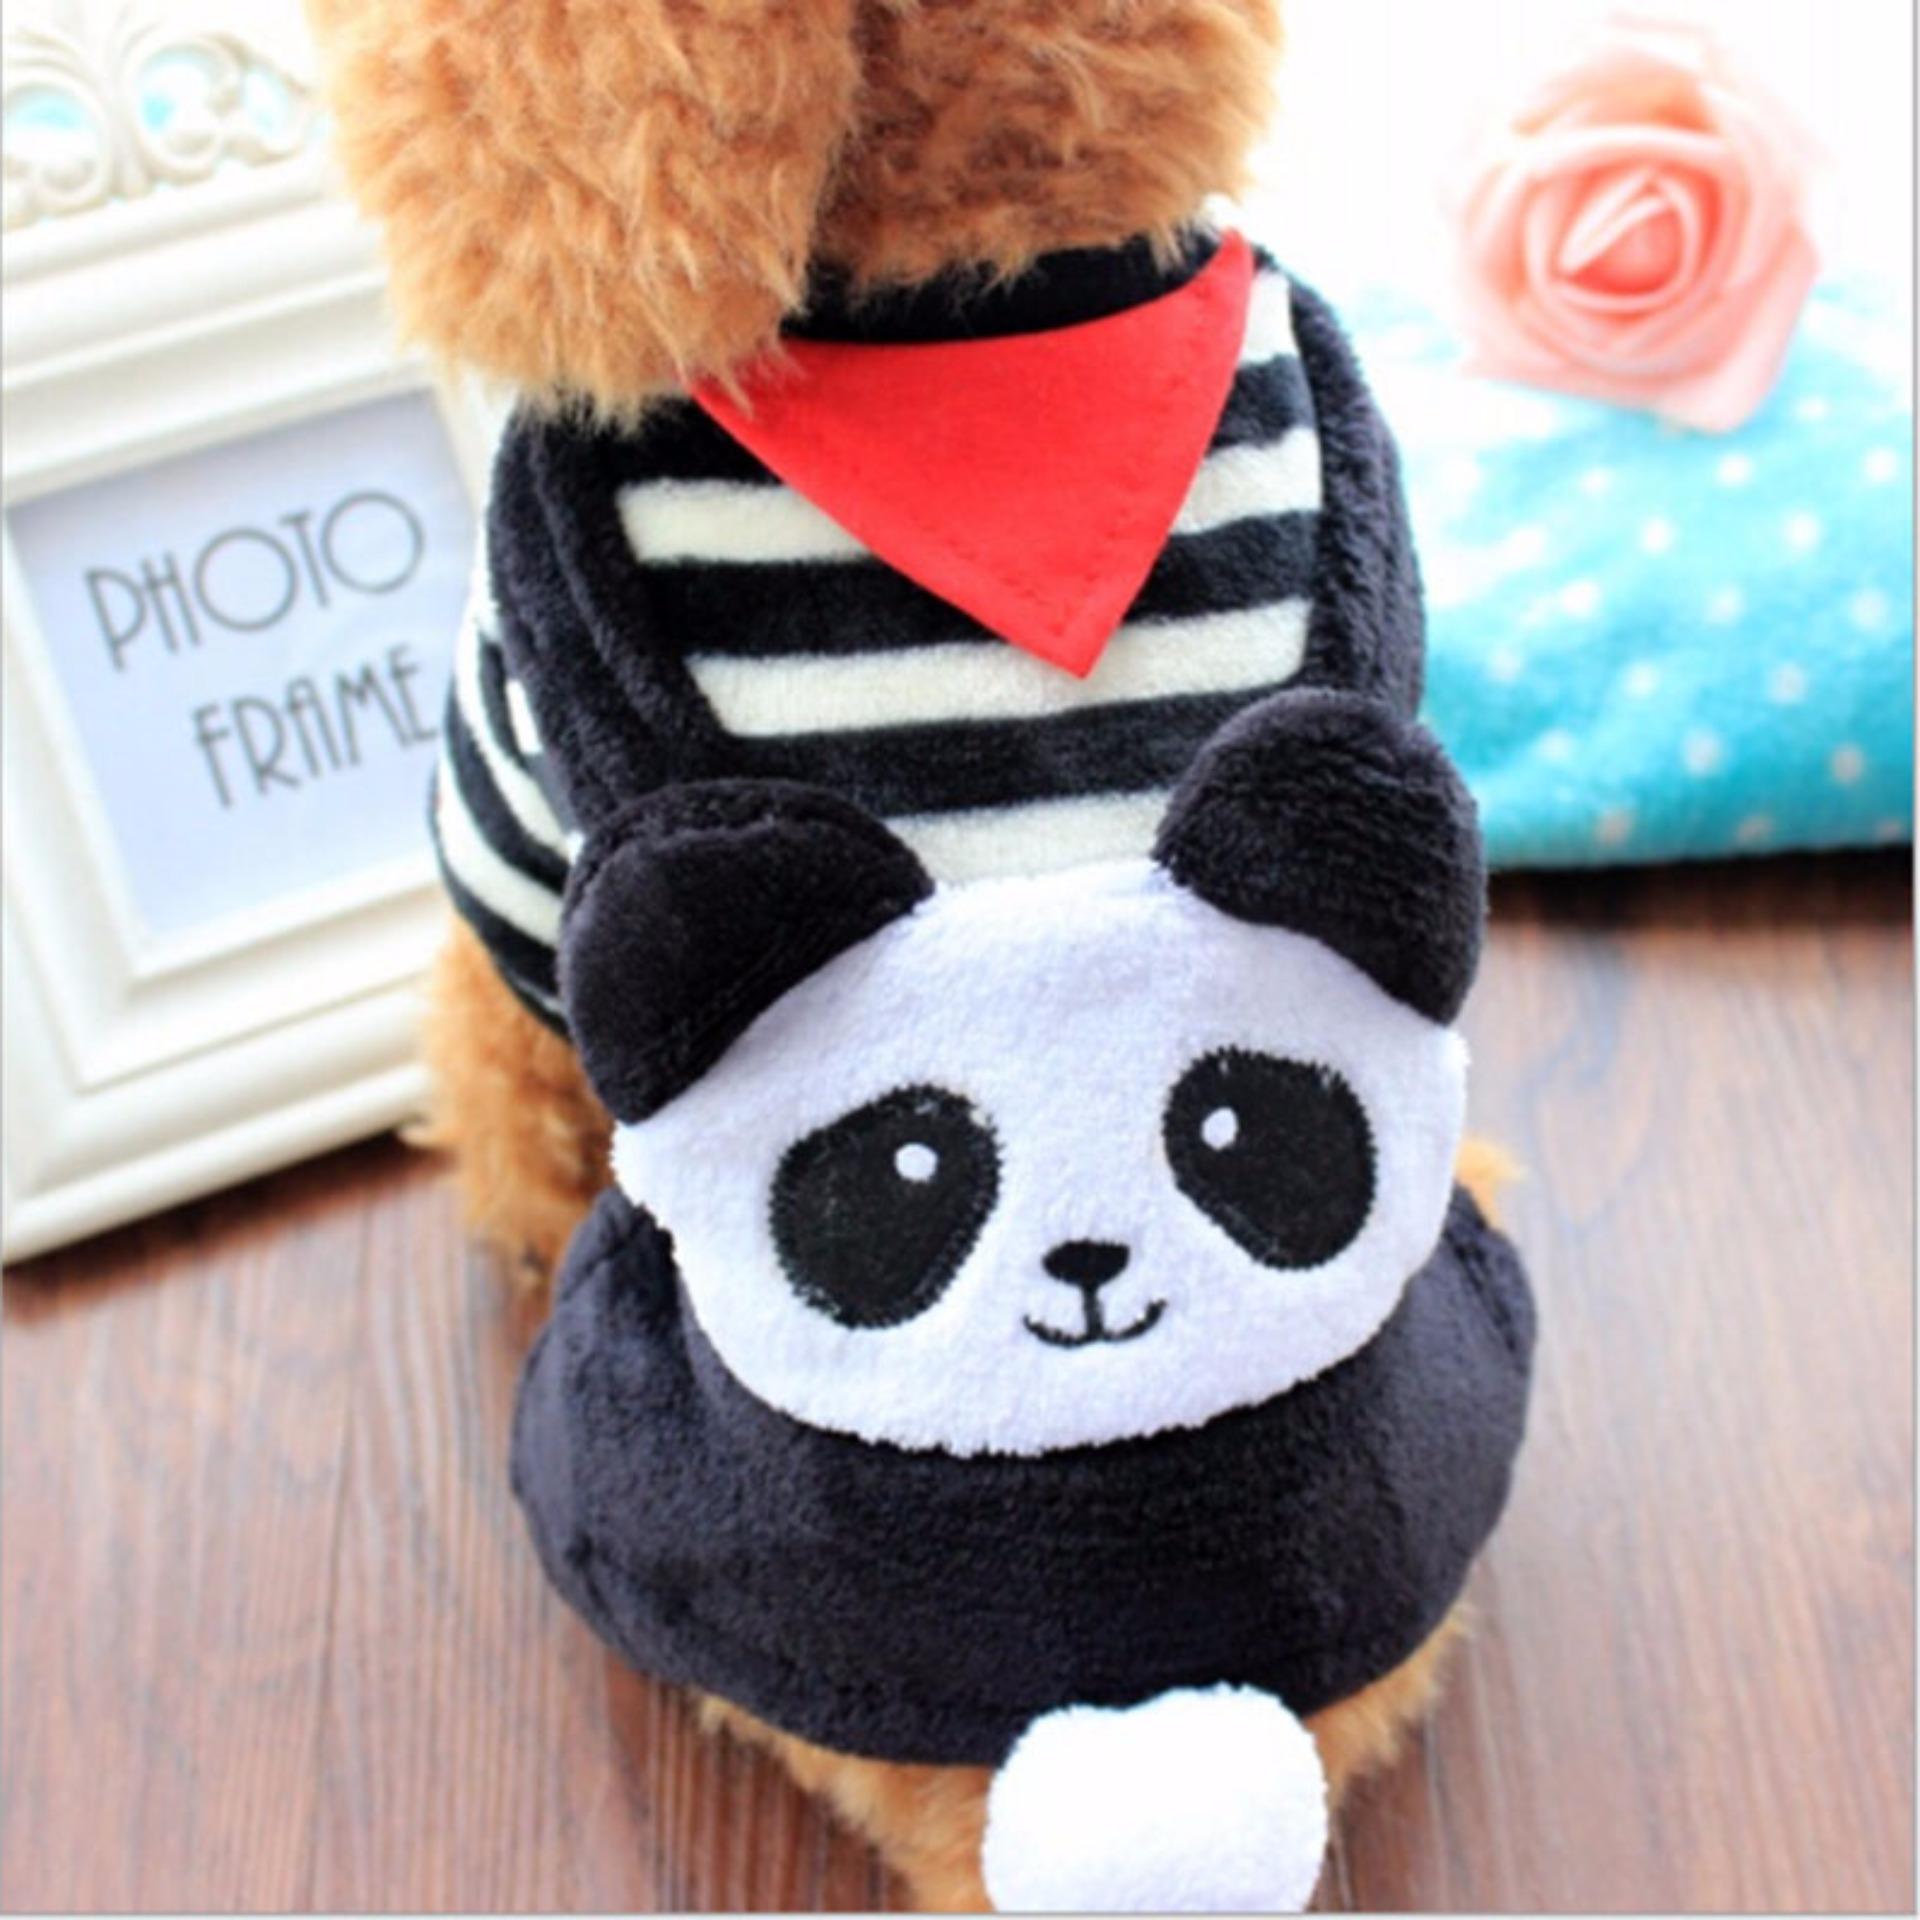 Puppy Pet Kostum / Baju Anjing Motif Panda (Model C) - Size M